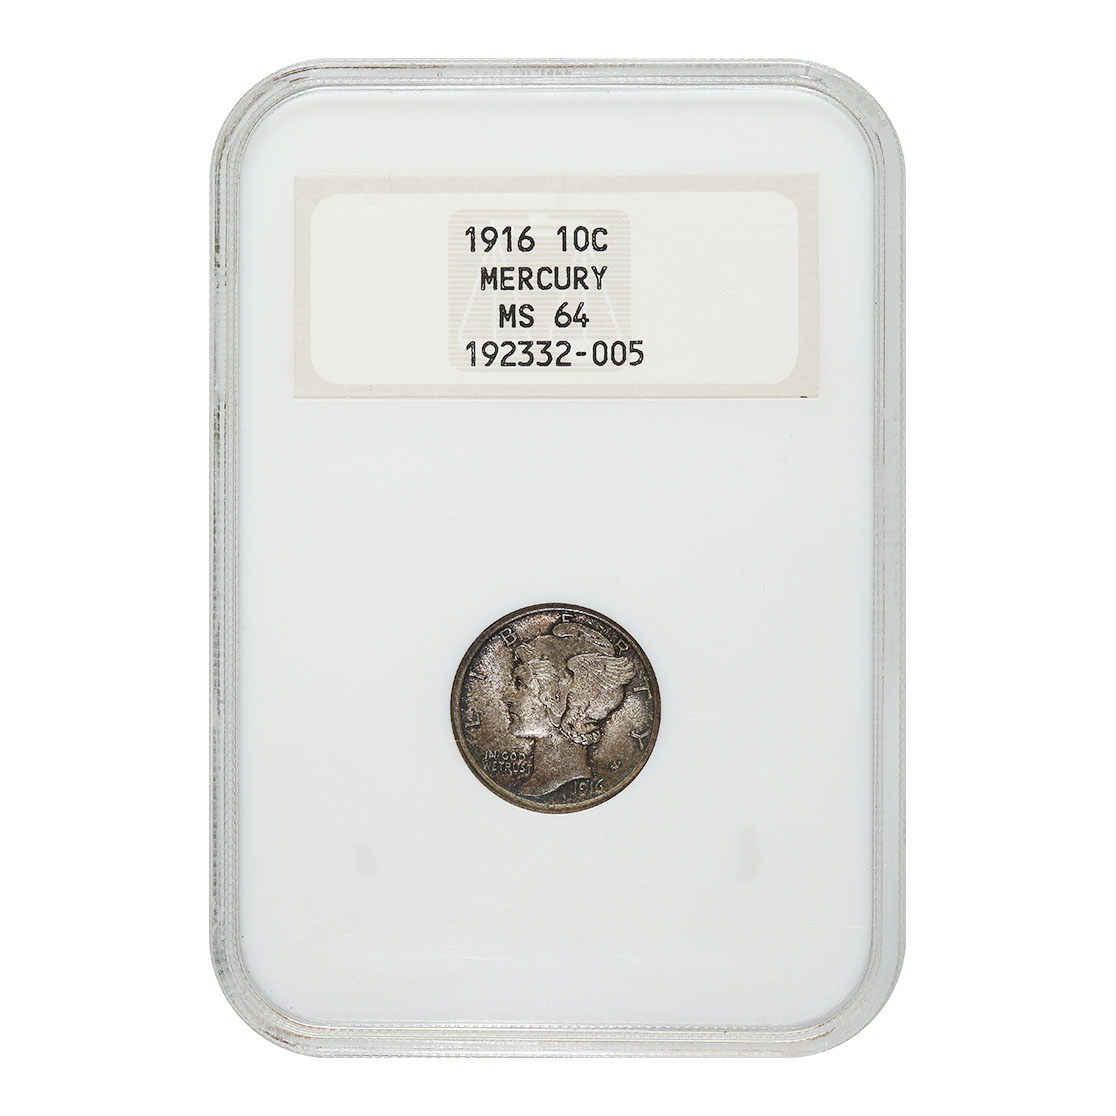 Certified Mercury Dimes